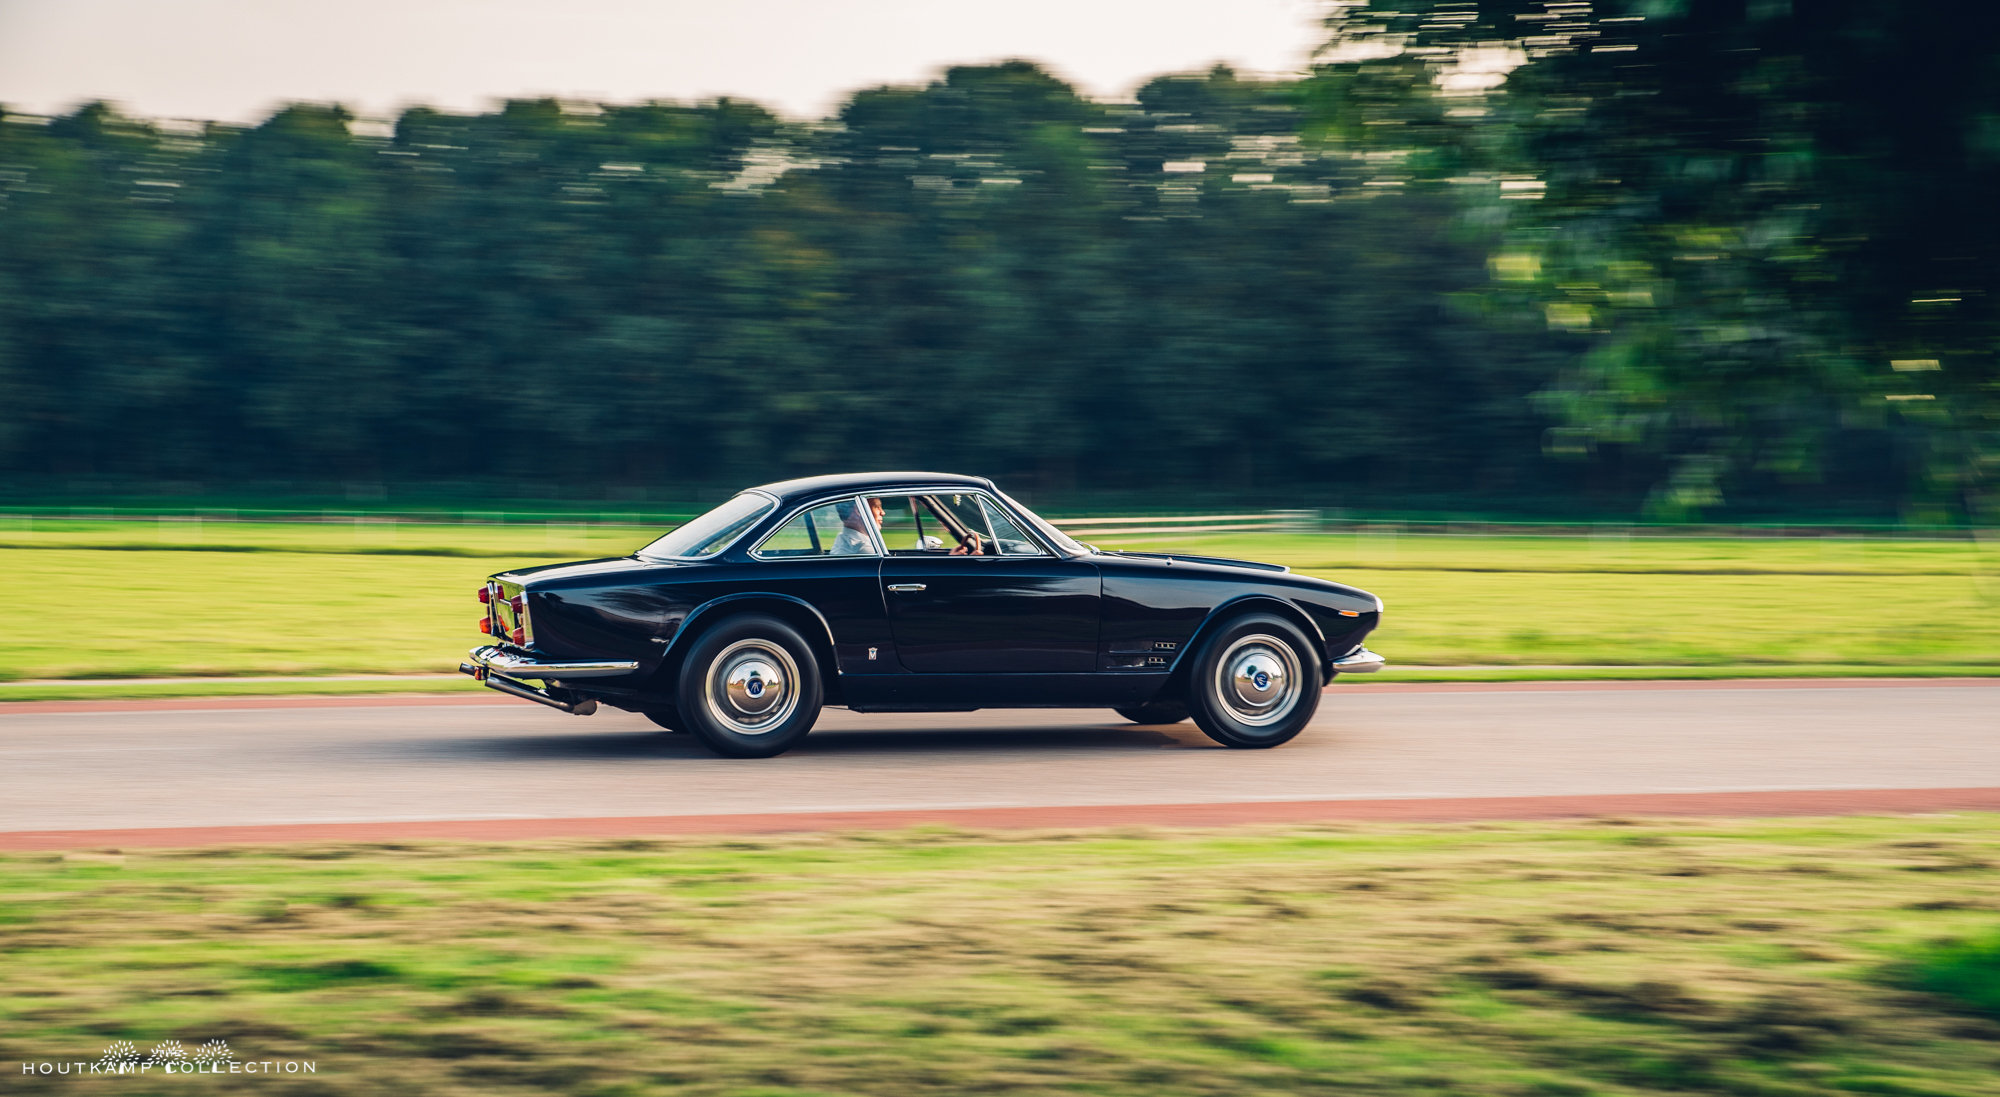 1963 MASERATI SEBRING 3500 GTI SERIES I For Sale (picture 3 of 6)